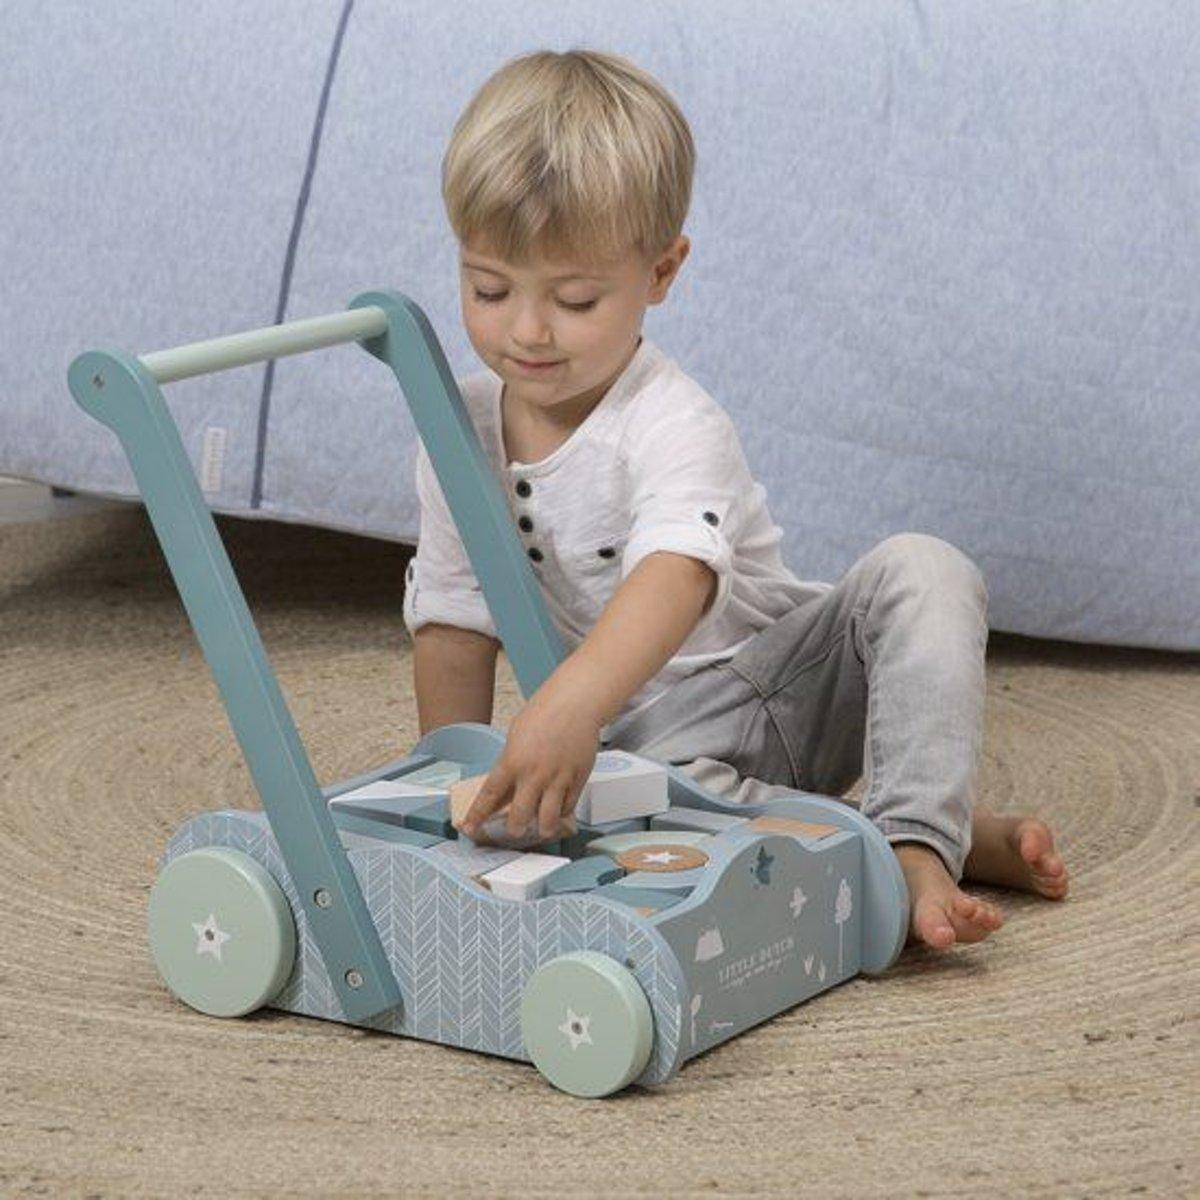 3c8c7871ee41de bol.com | Little Dutch Blokkenkar Adventure Mint Groen, Little Dutch |  Speelgoed